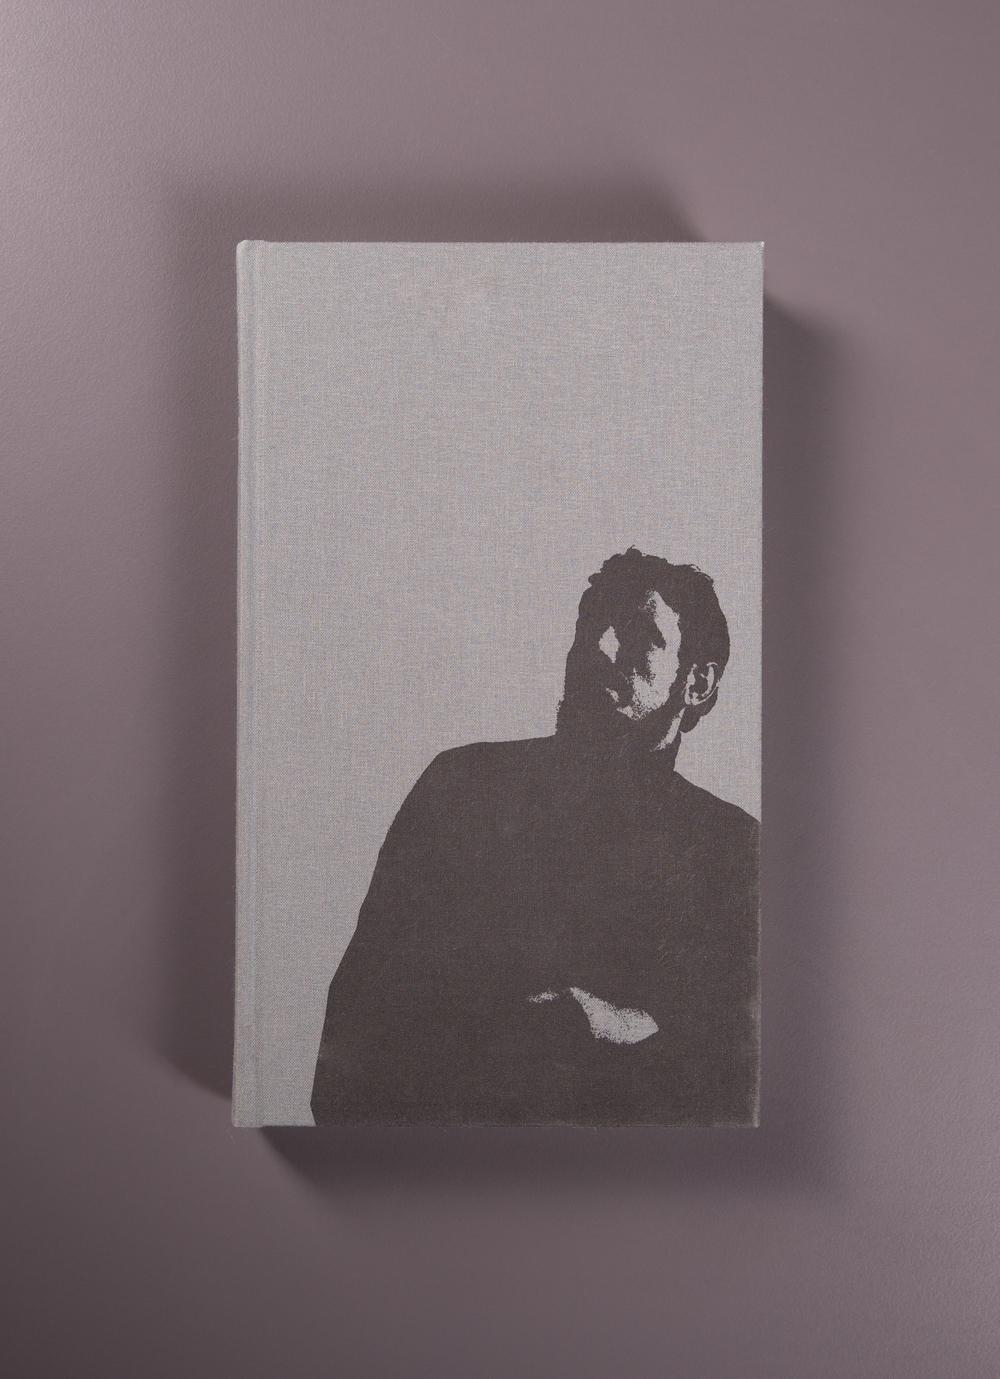 Vitas Luckus. Biography